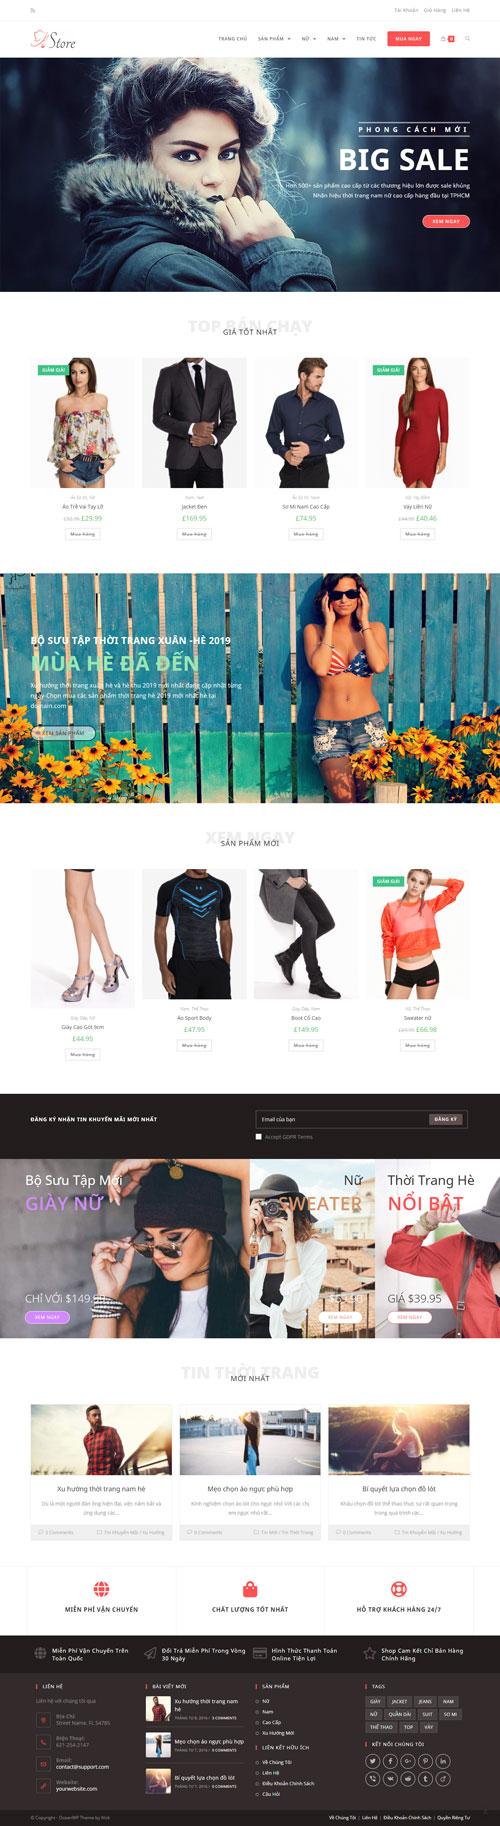 Website thời trang nam nữ Store 1